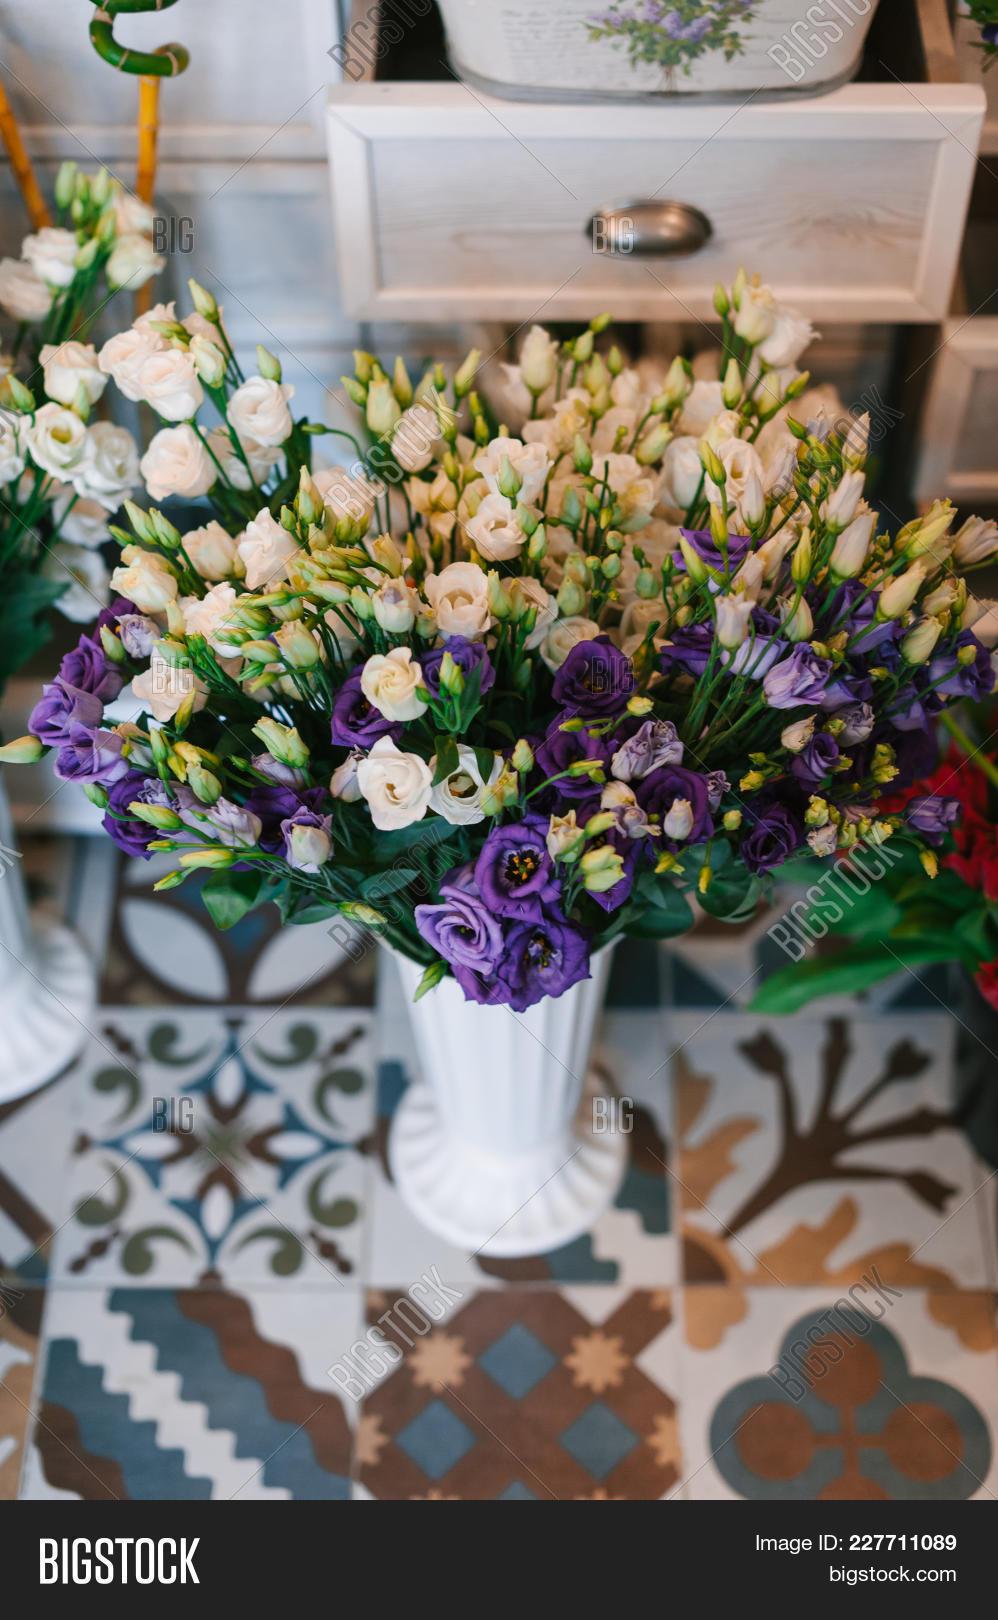 Beautiful fresh image photo free trial bigstock beautiful fresh flowers in pots in a flower shop with beautiful decorated vintage floor izmirmasajfo